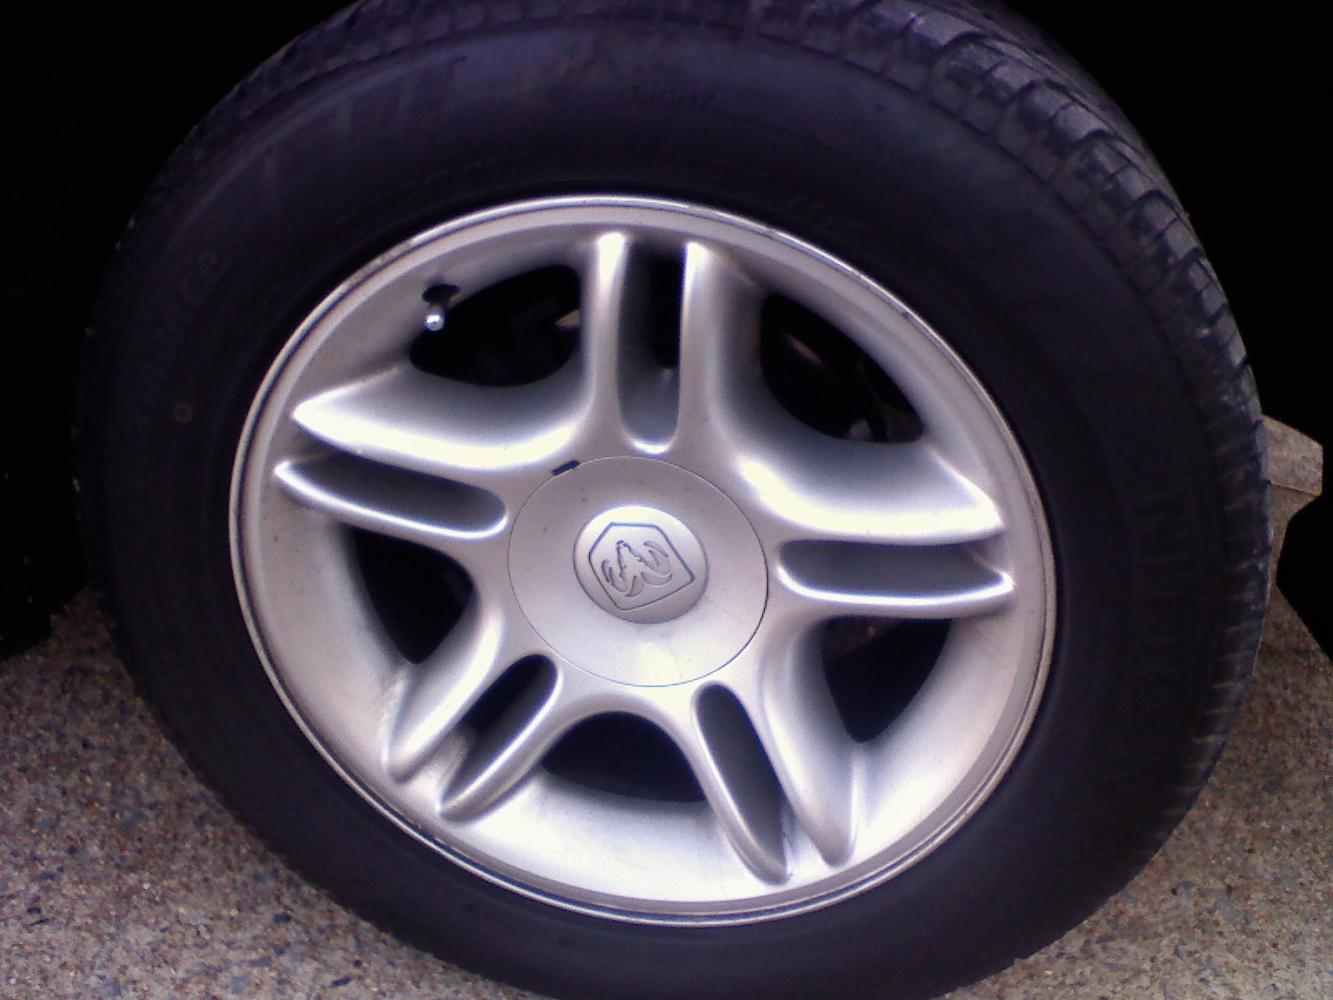 D Inch Rt Wheels Tires on 2001 Dodge Dakota Bed Size